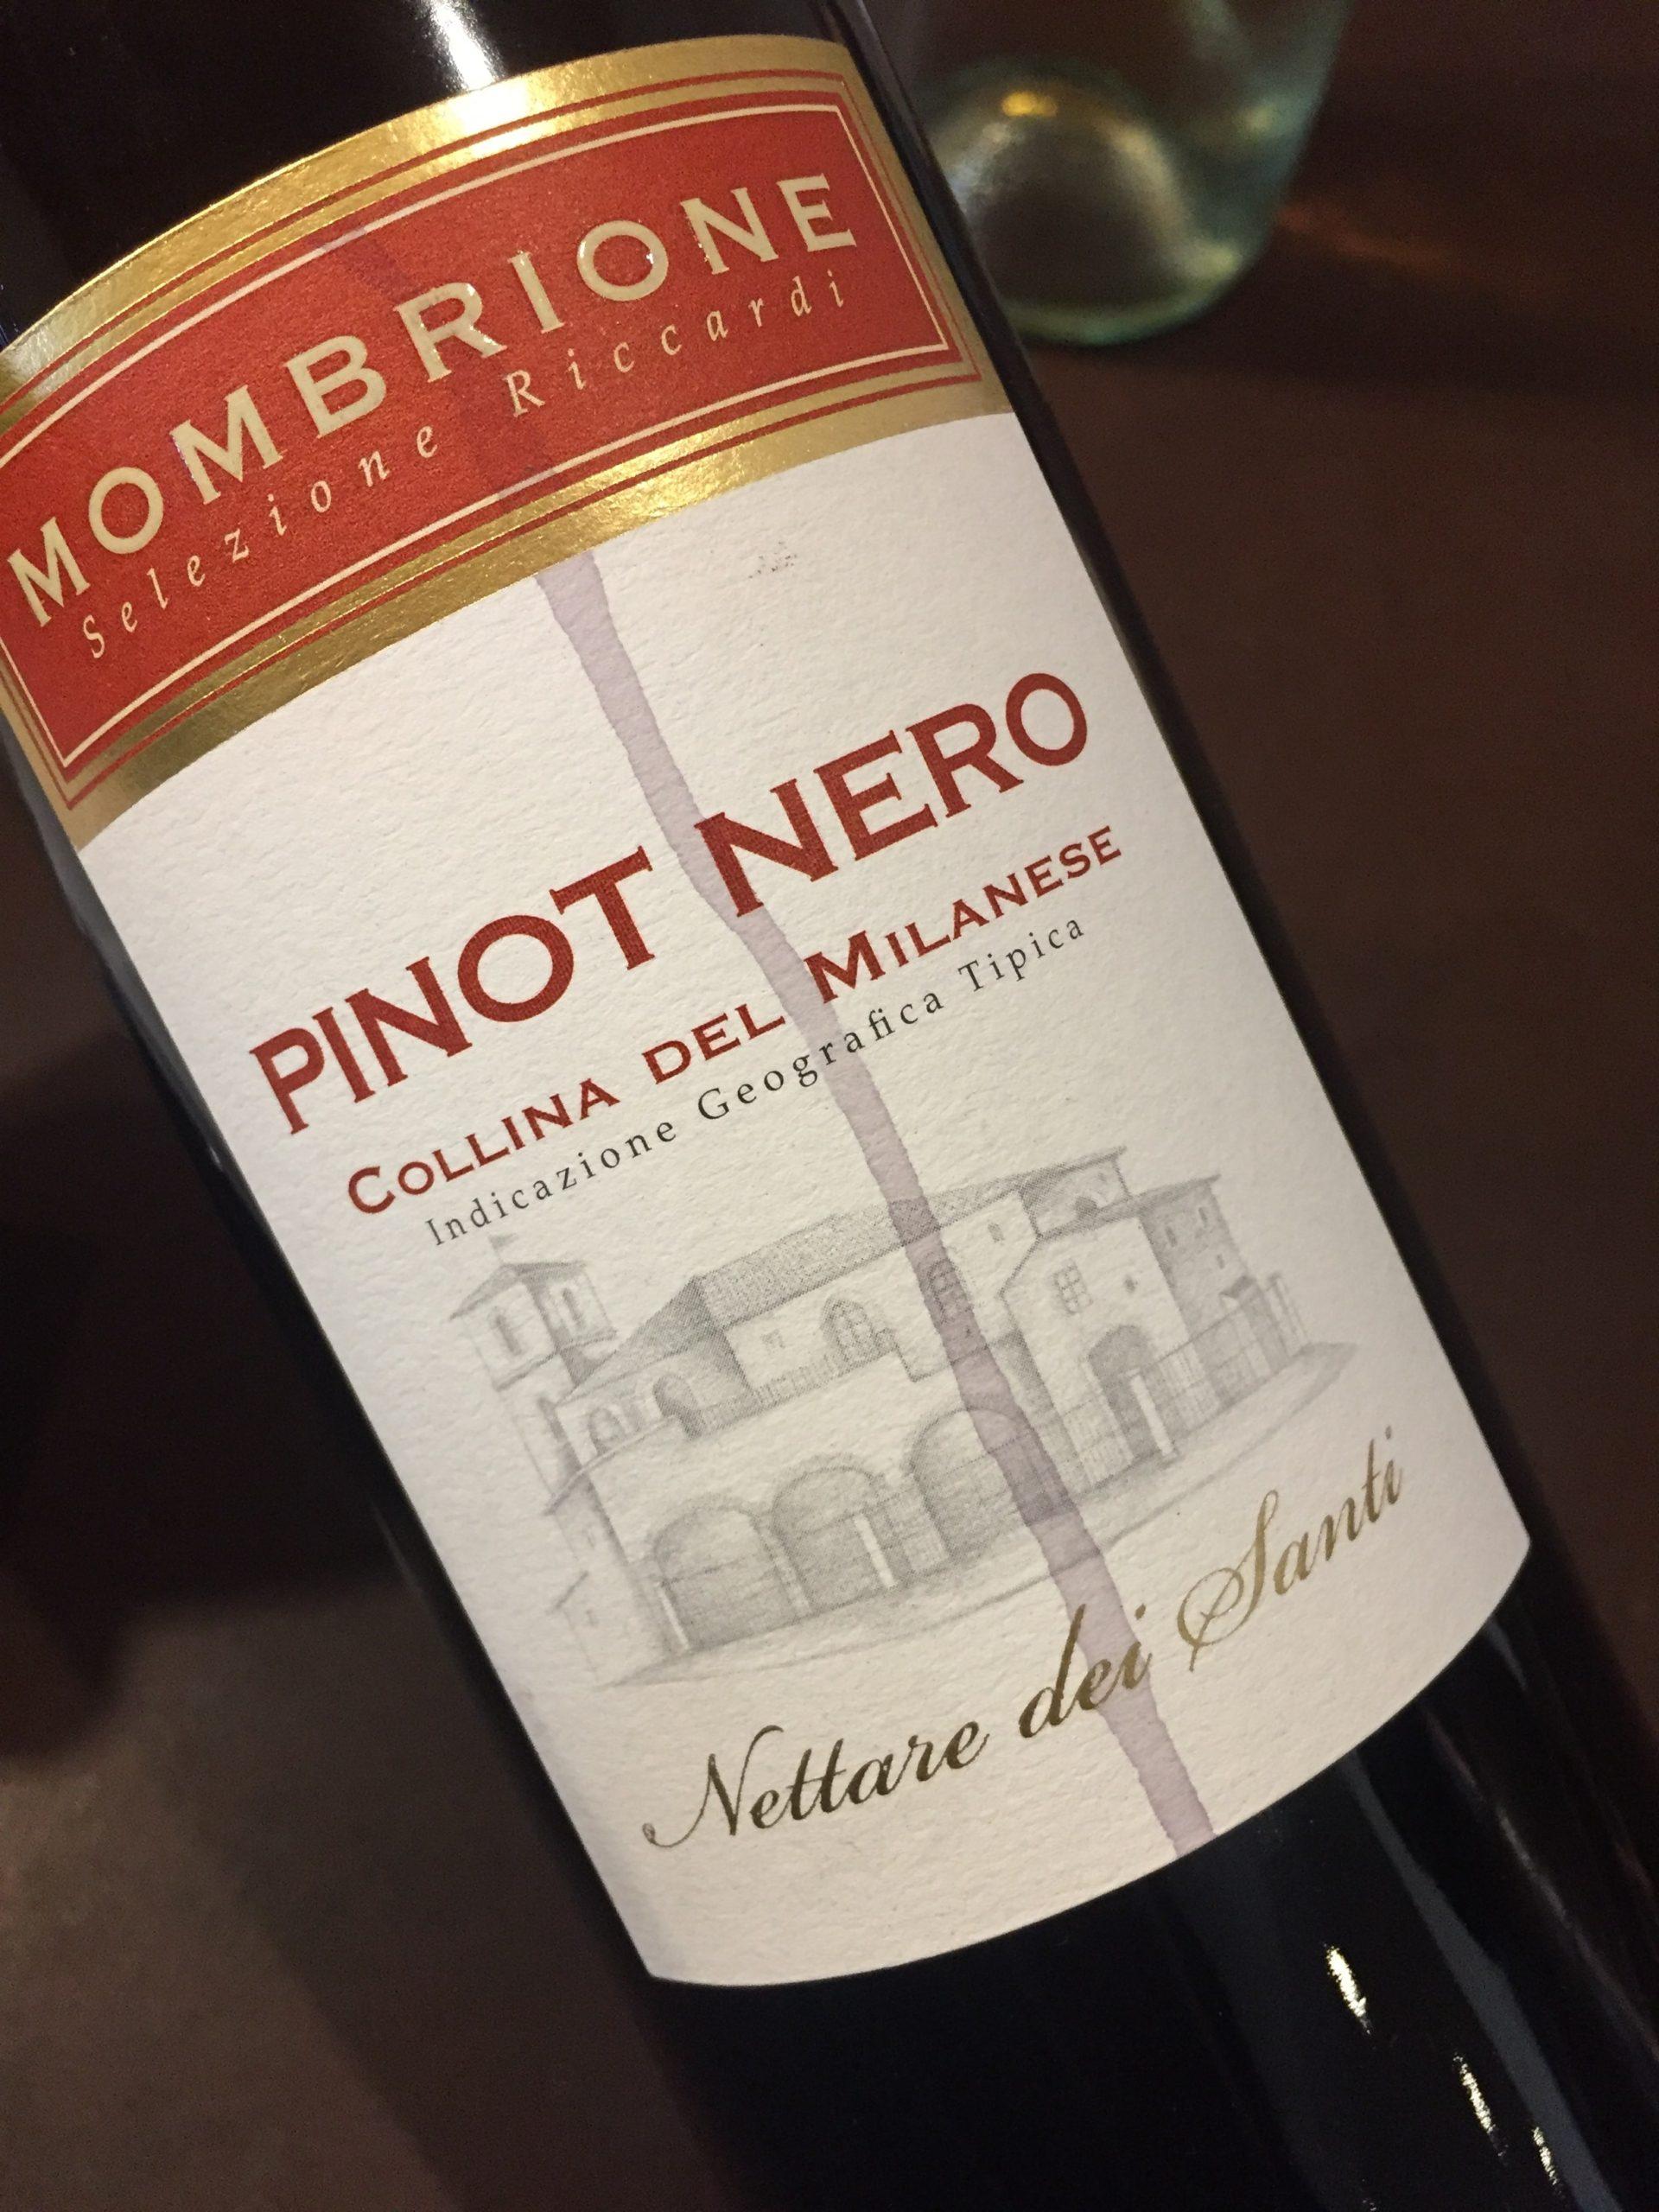 Pinot Nero Nettare dei santi